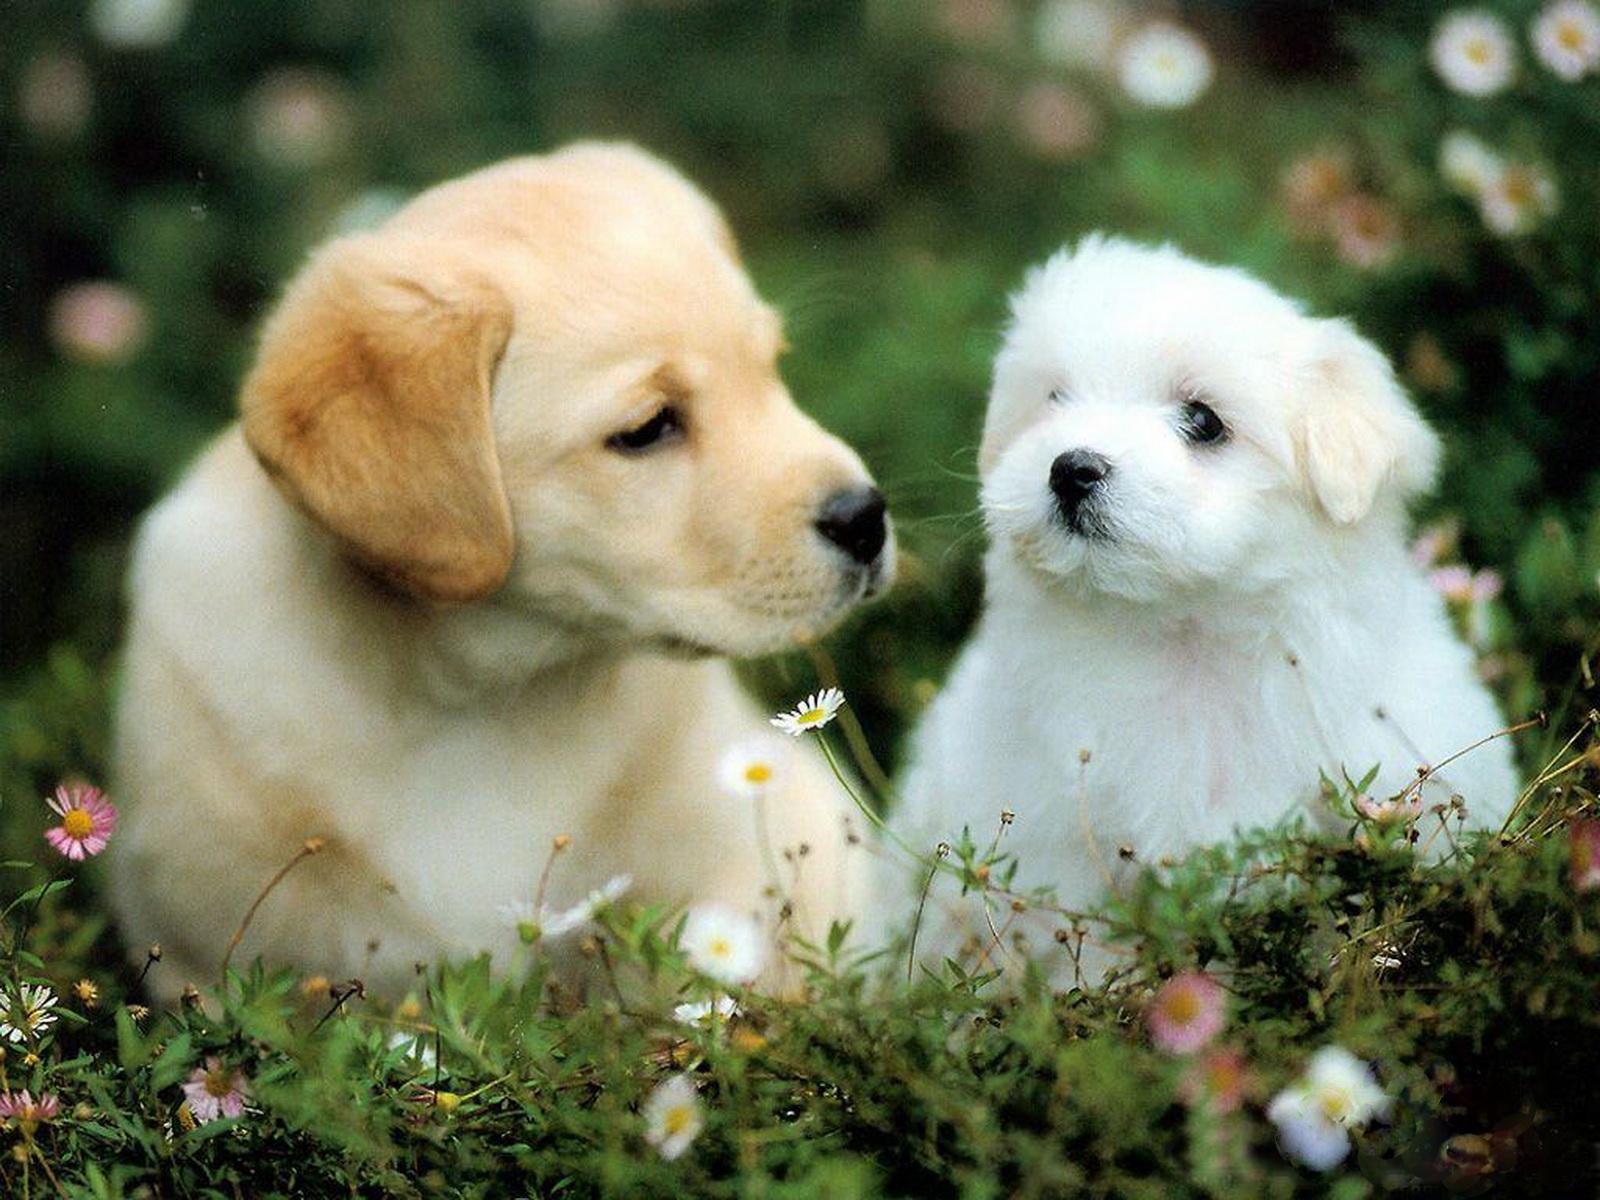 WallpaperfreekS HD Cute Dogs Wallpapers 1600X1200 1600x1200